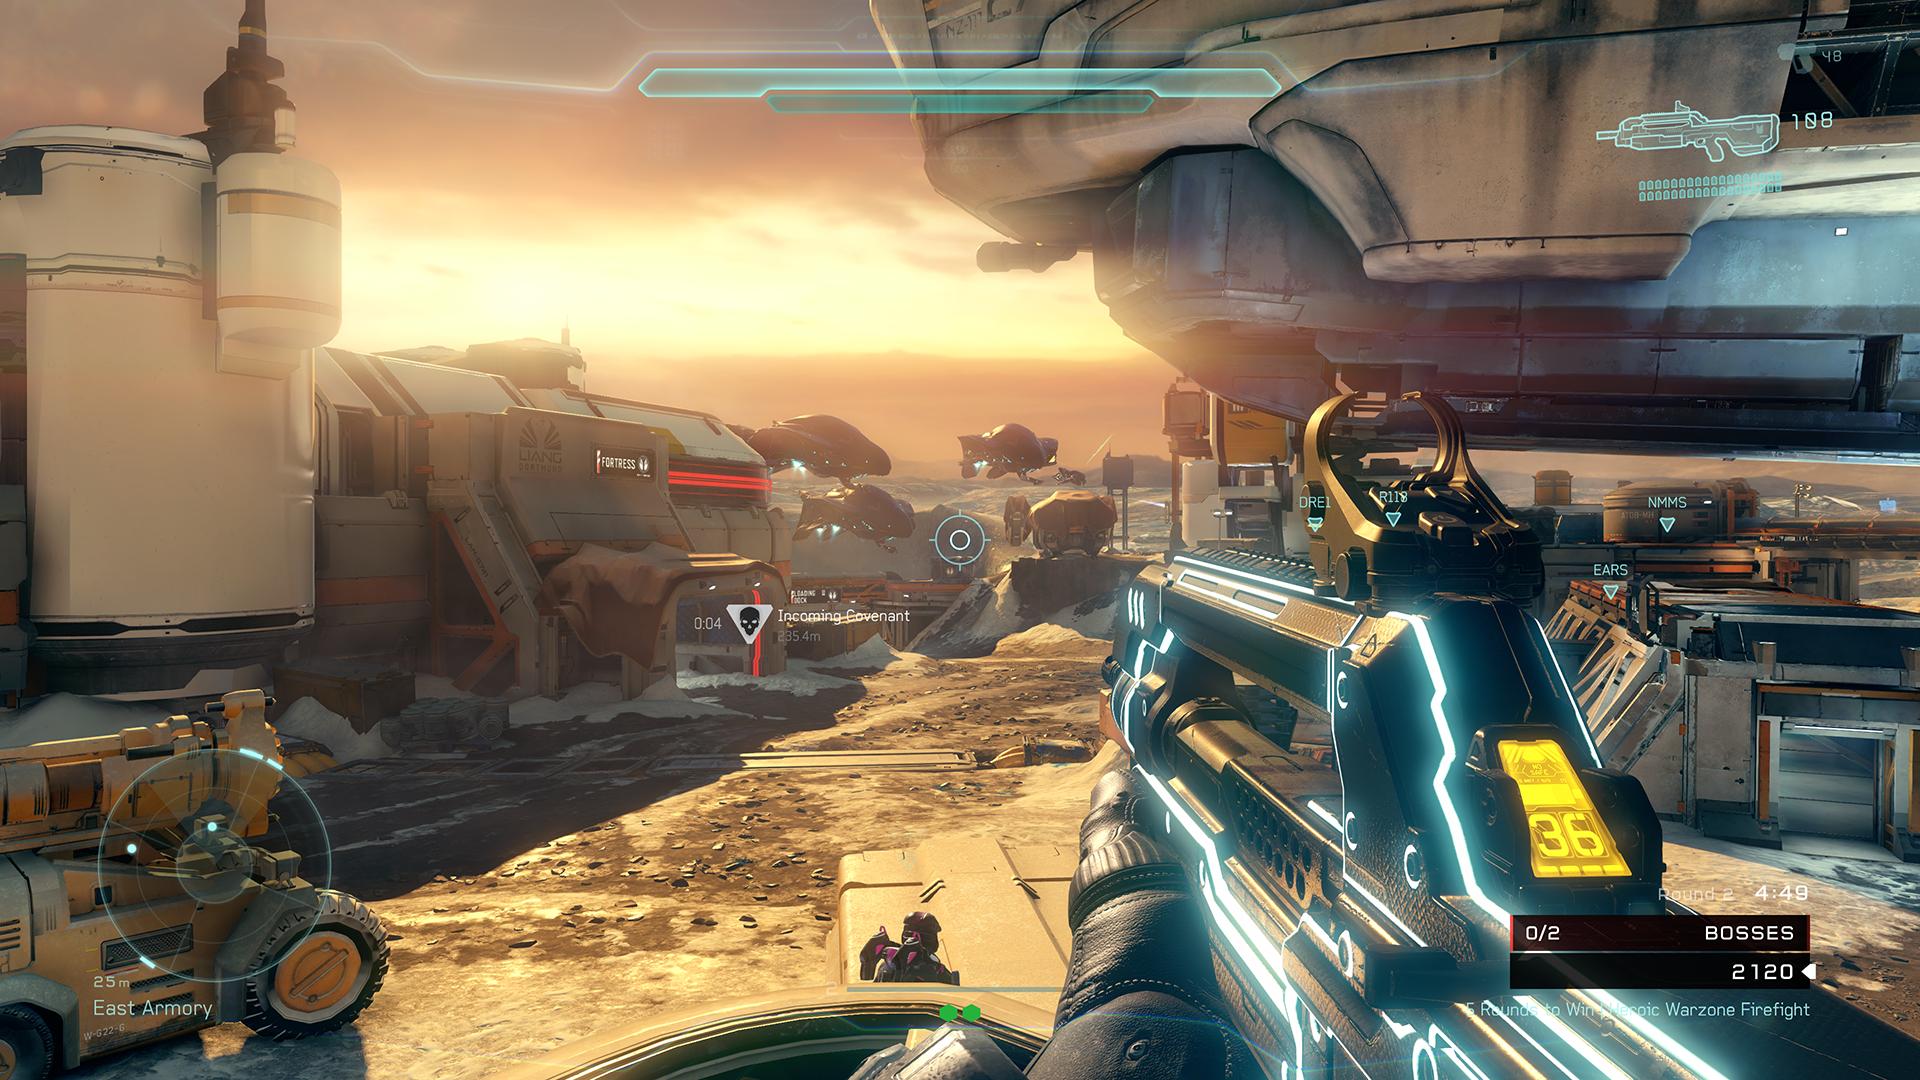 Halo 5: Guardians multiplayer vista screenshot